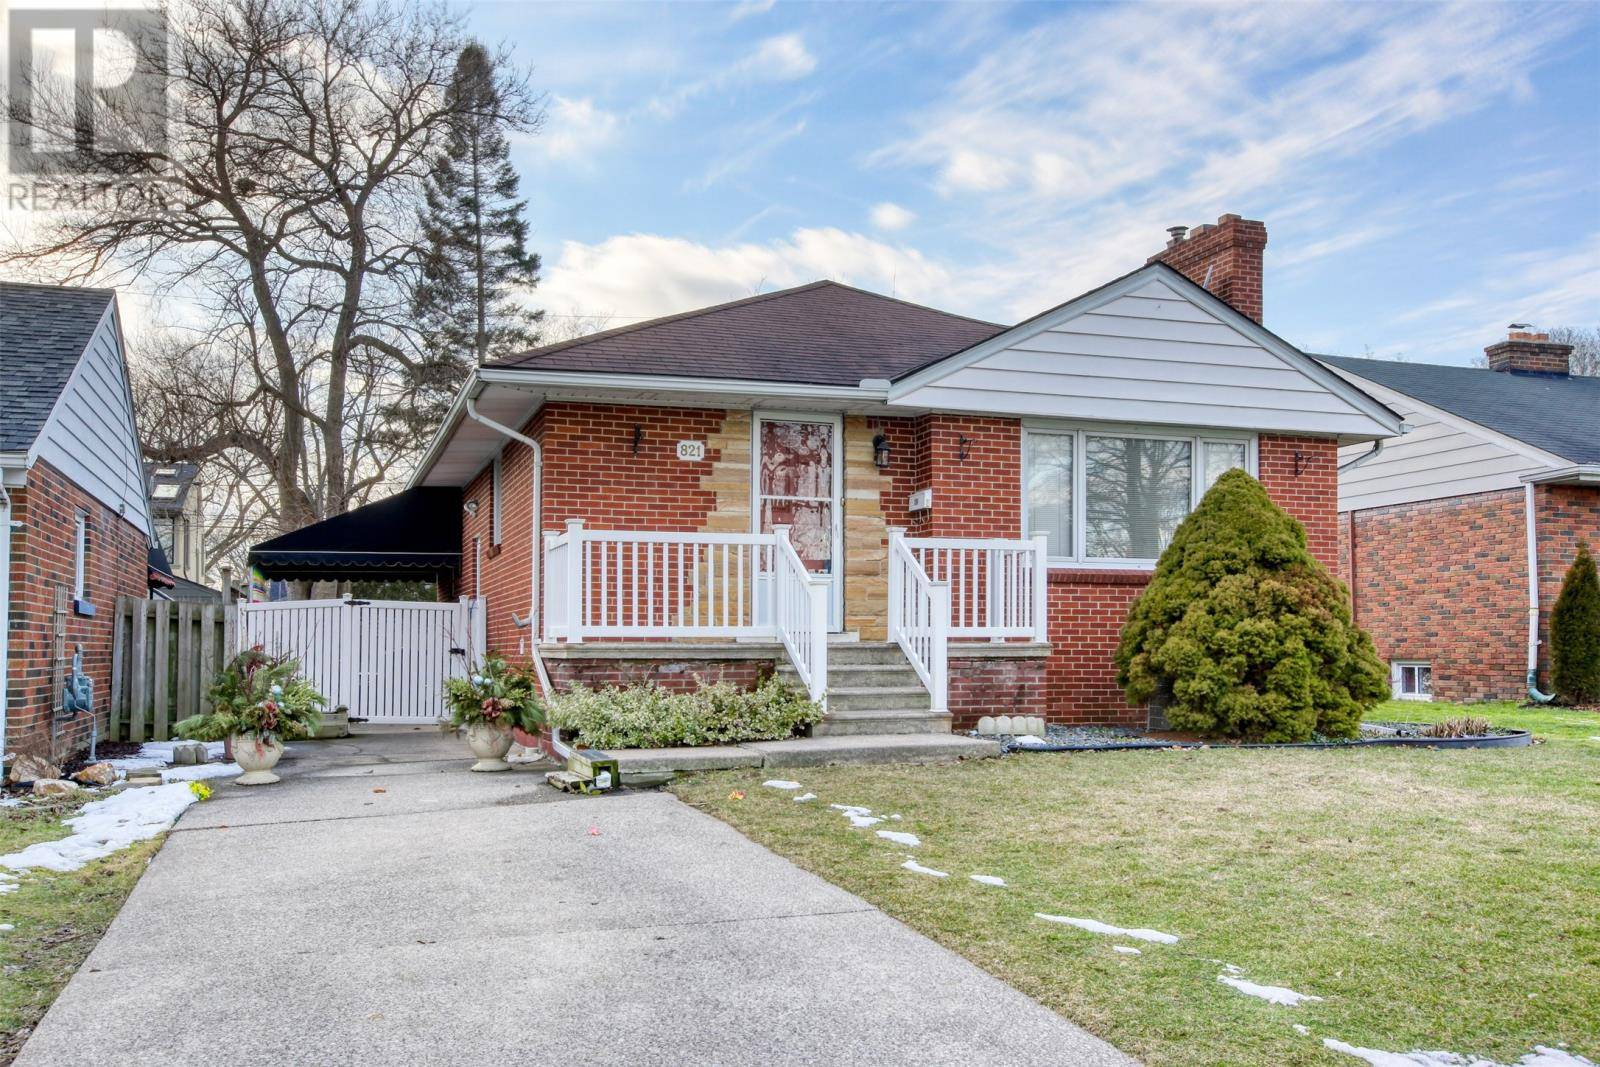 House for sale at 821 Matthew Brady  Windsor Ontario - MLS: 20002001